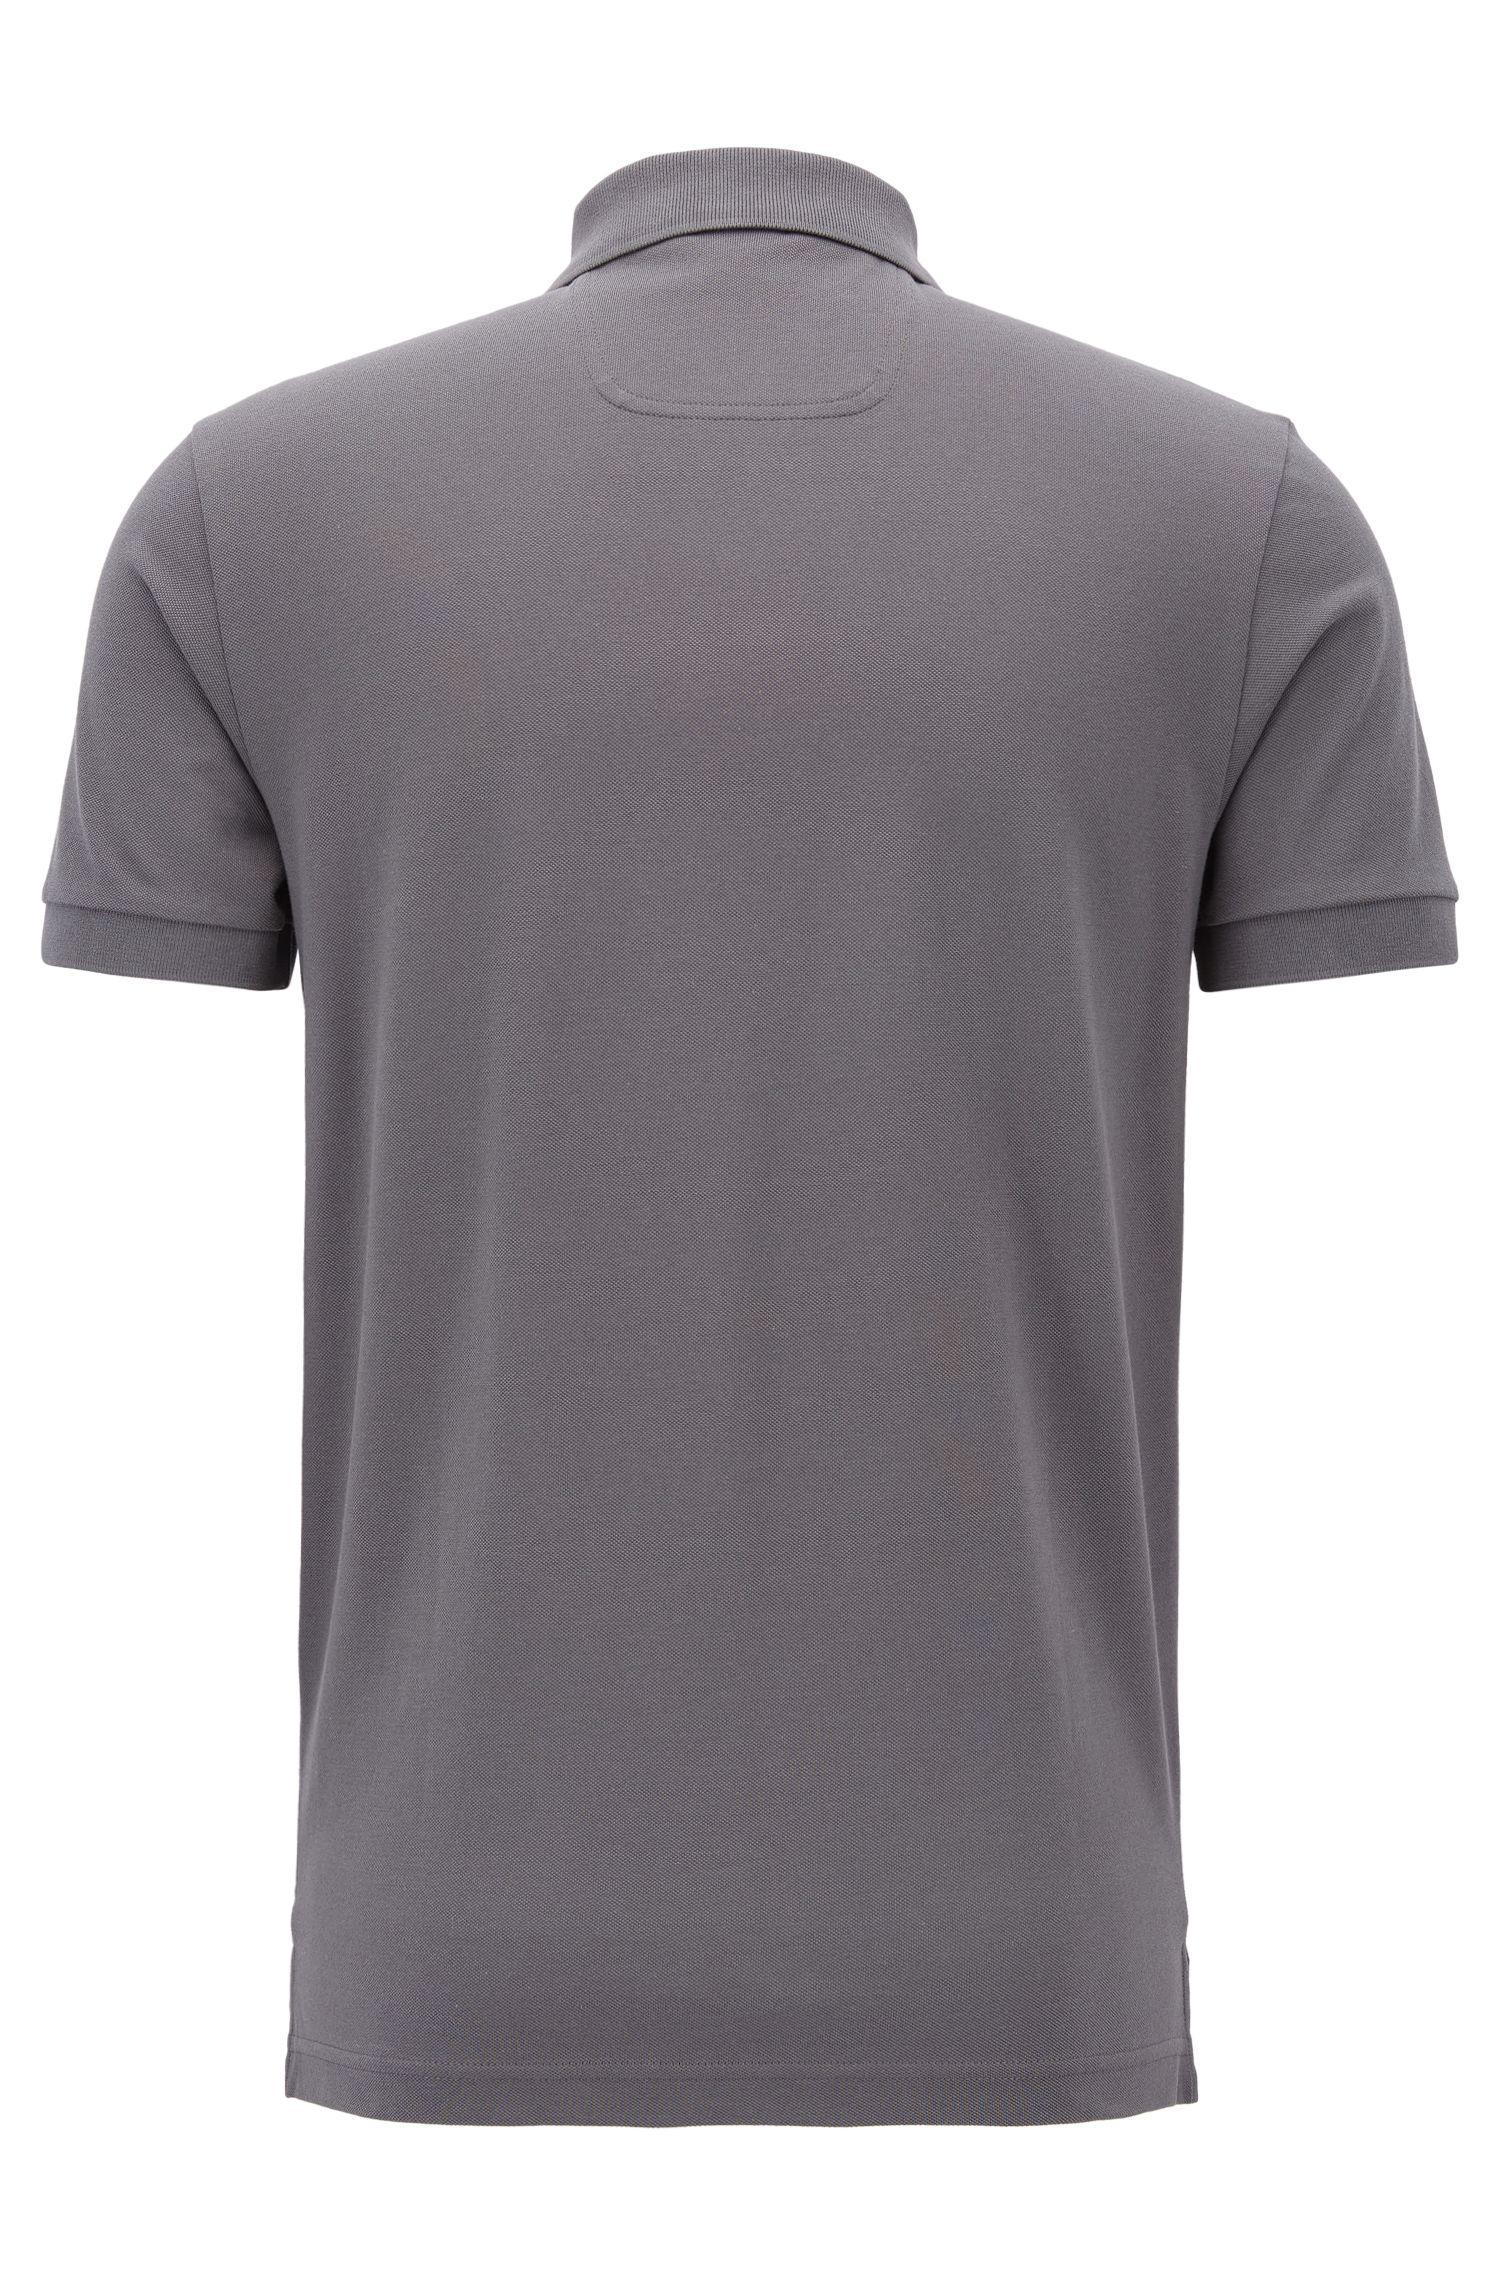 Poloshirt aus Pima-Baumwolle, Anthrazit